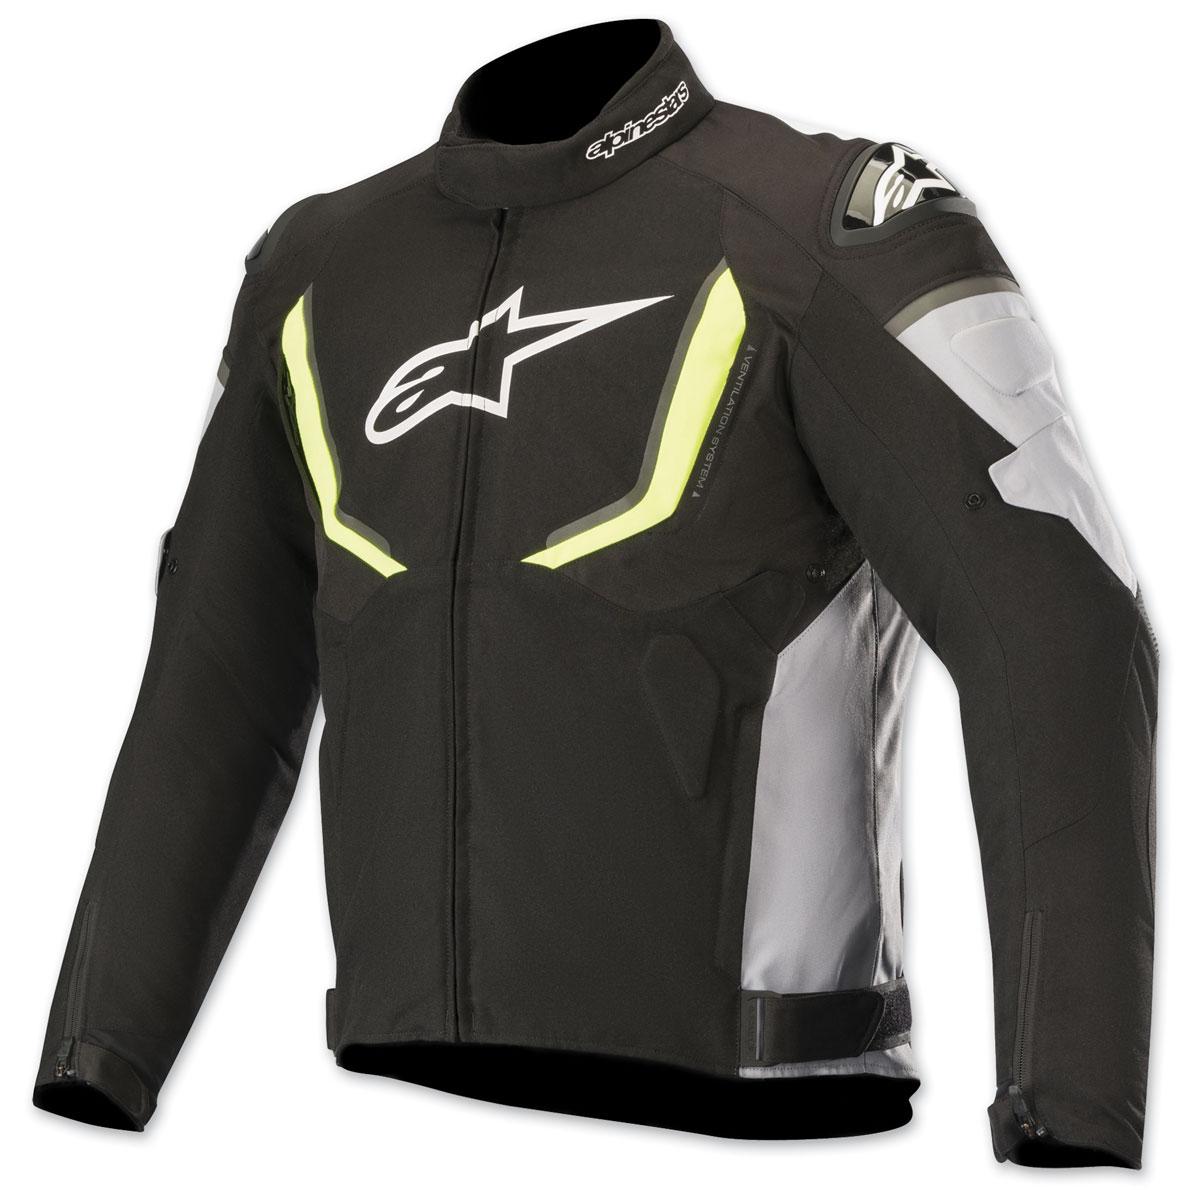 Alpinestars Men's T-GPR v2 Waterproof Black/White/Yellow Textile Jacket